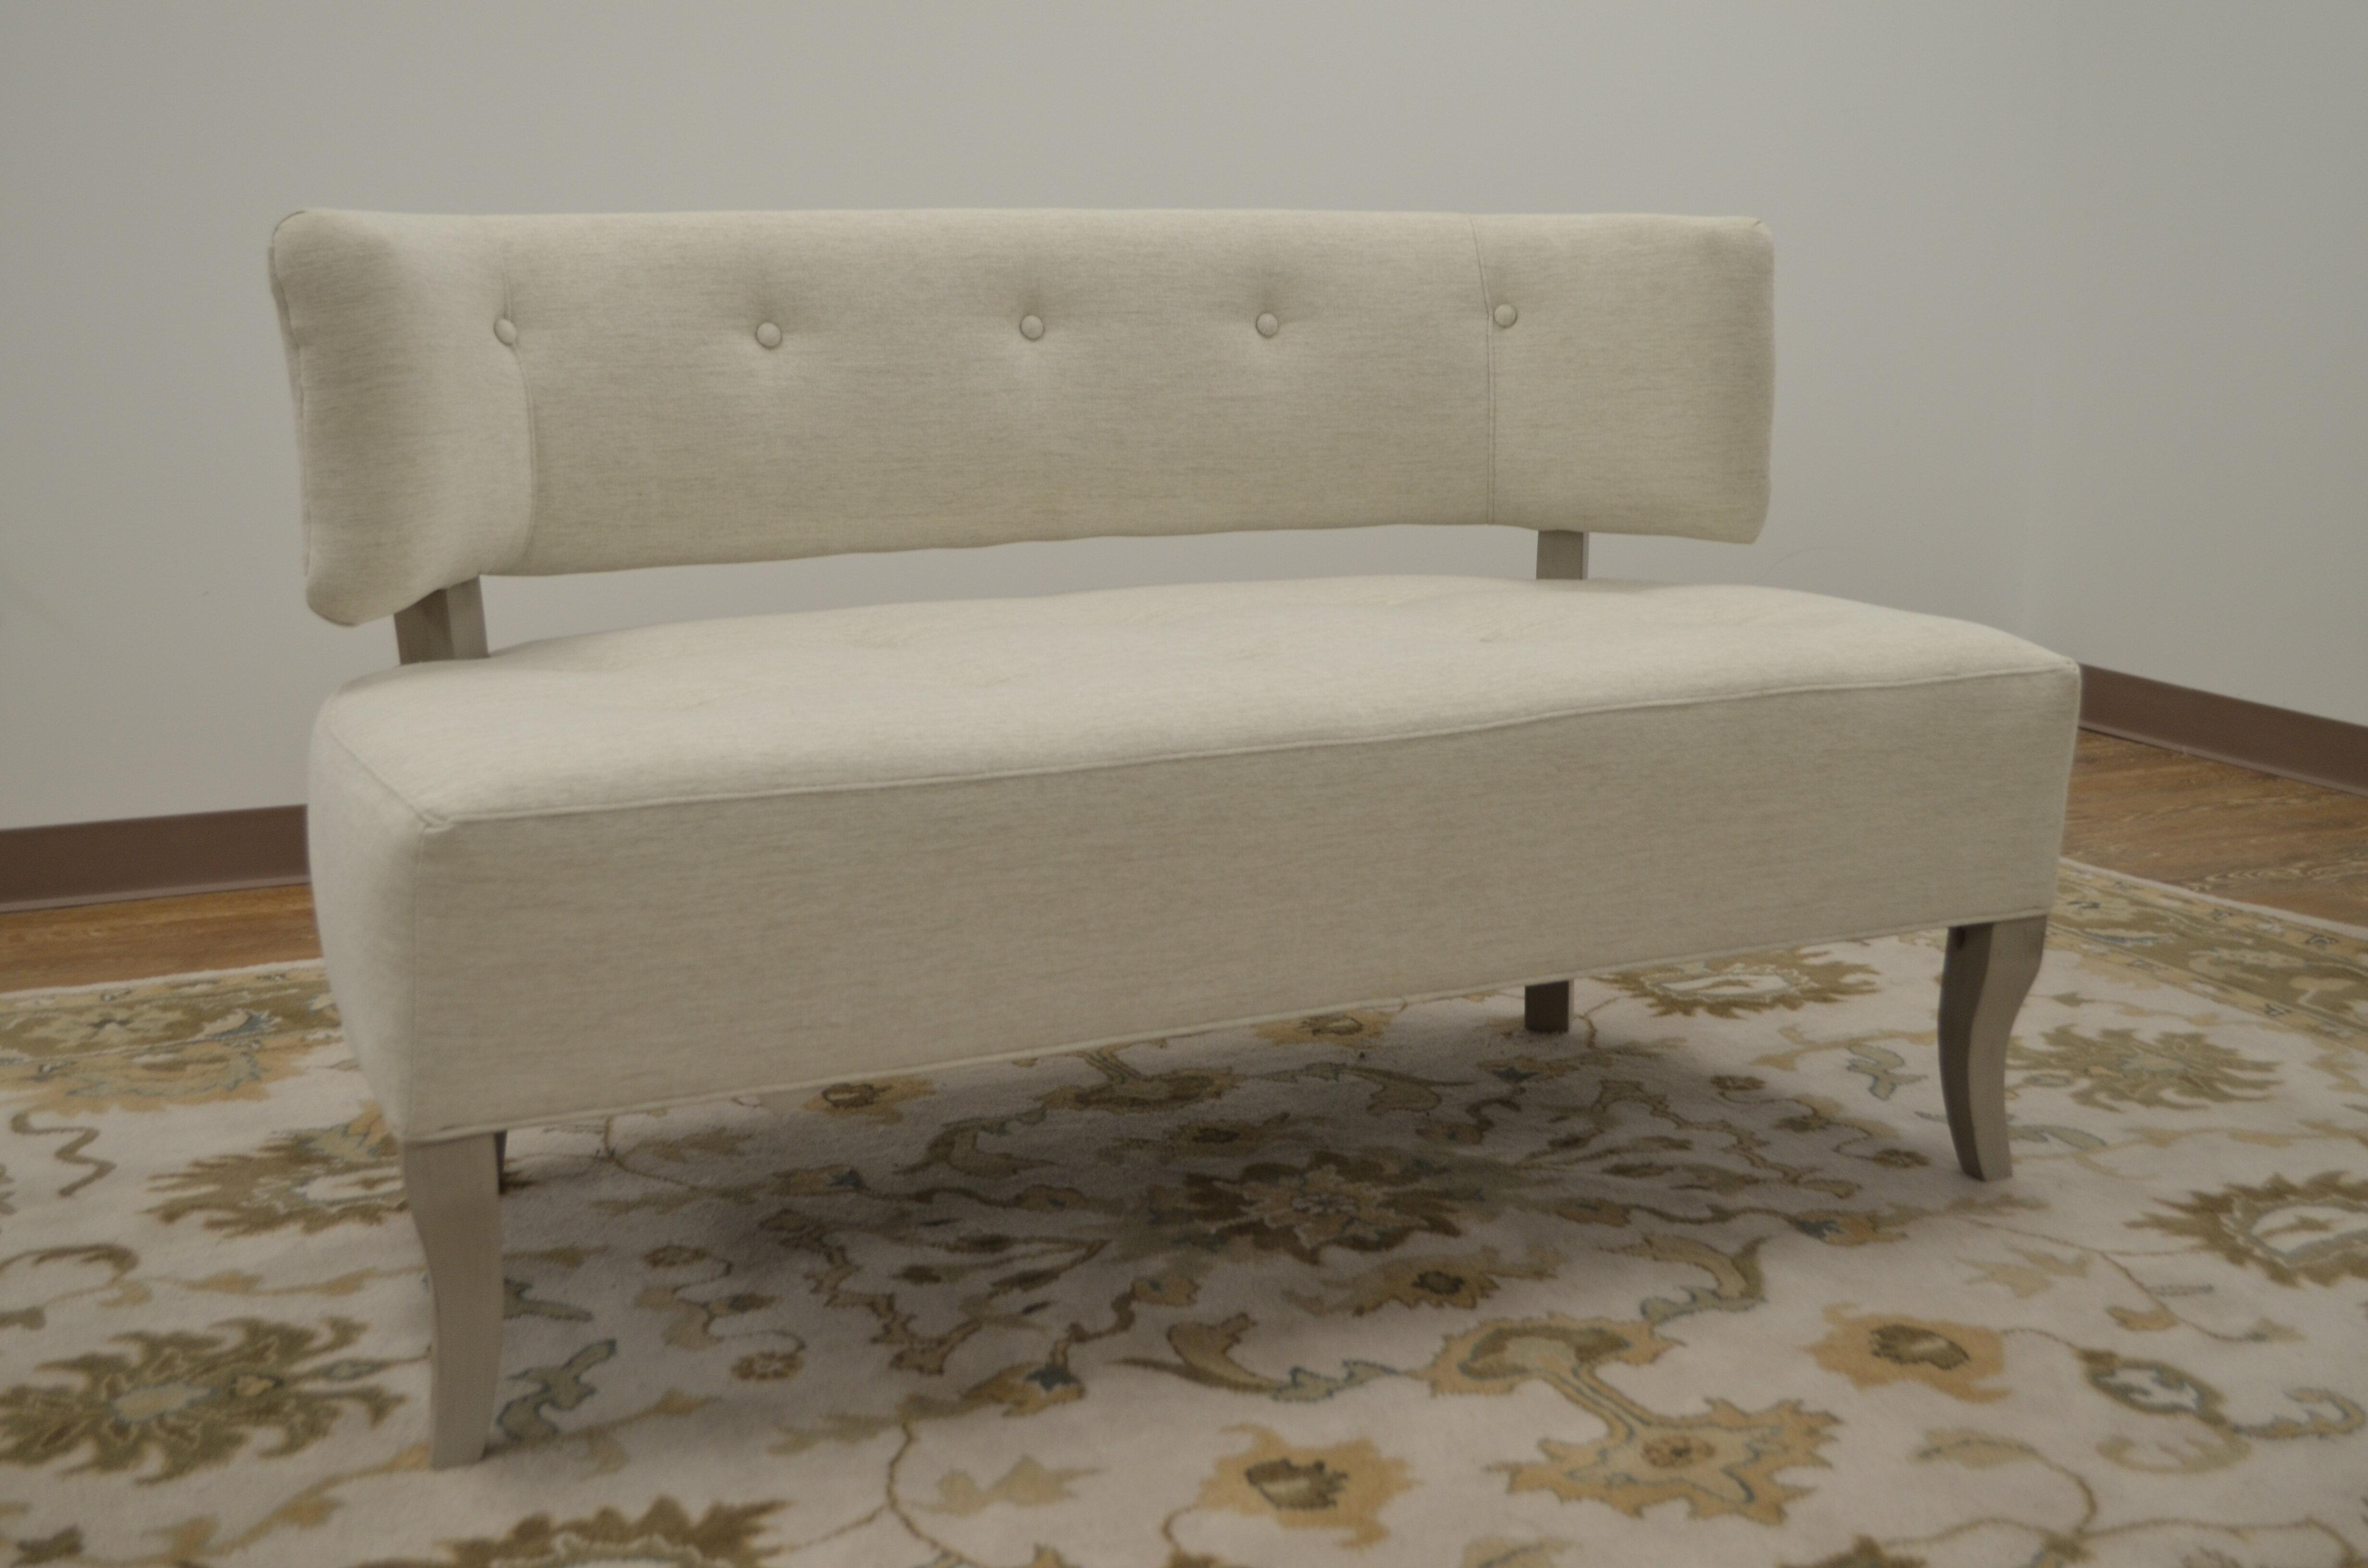 Rachael Ray Home Settee Upholstered Bedroom Bench   Wayfair